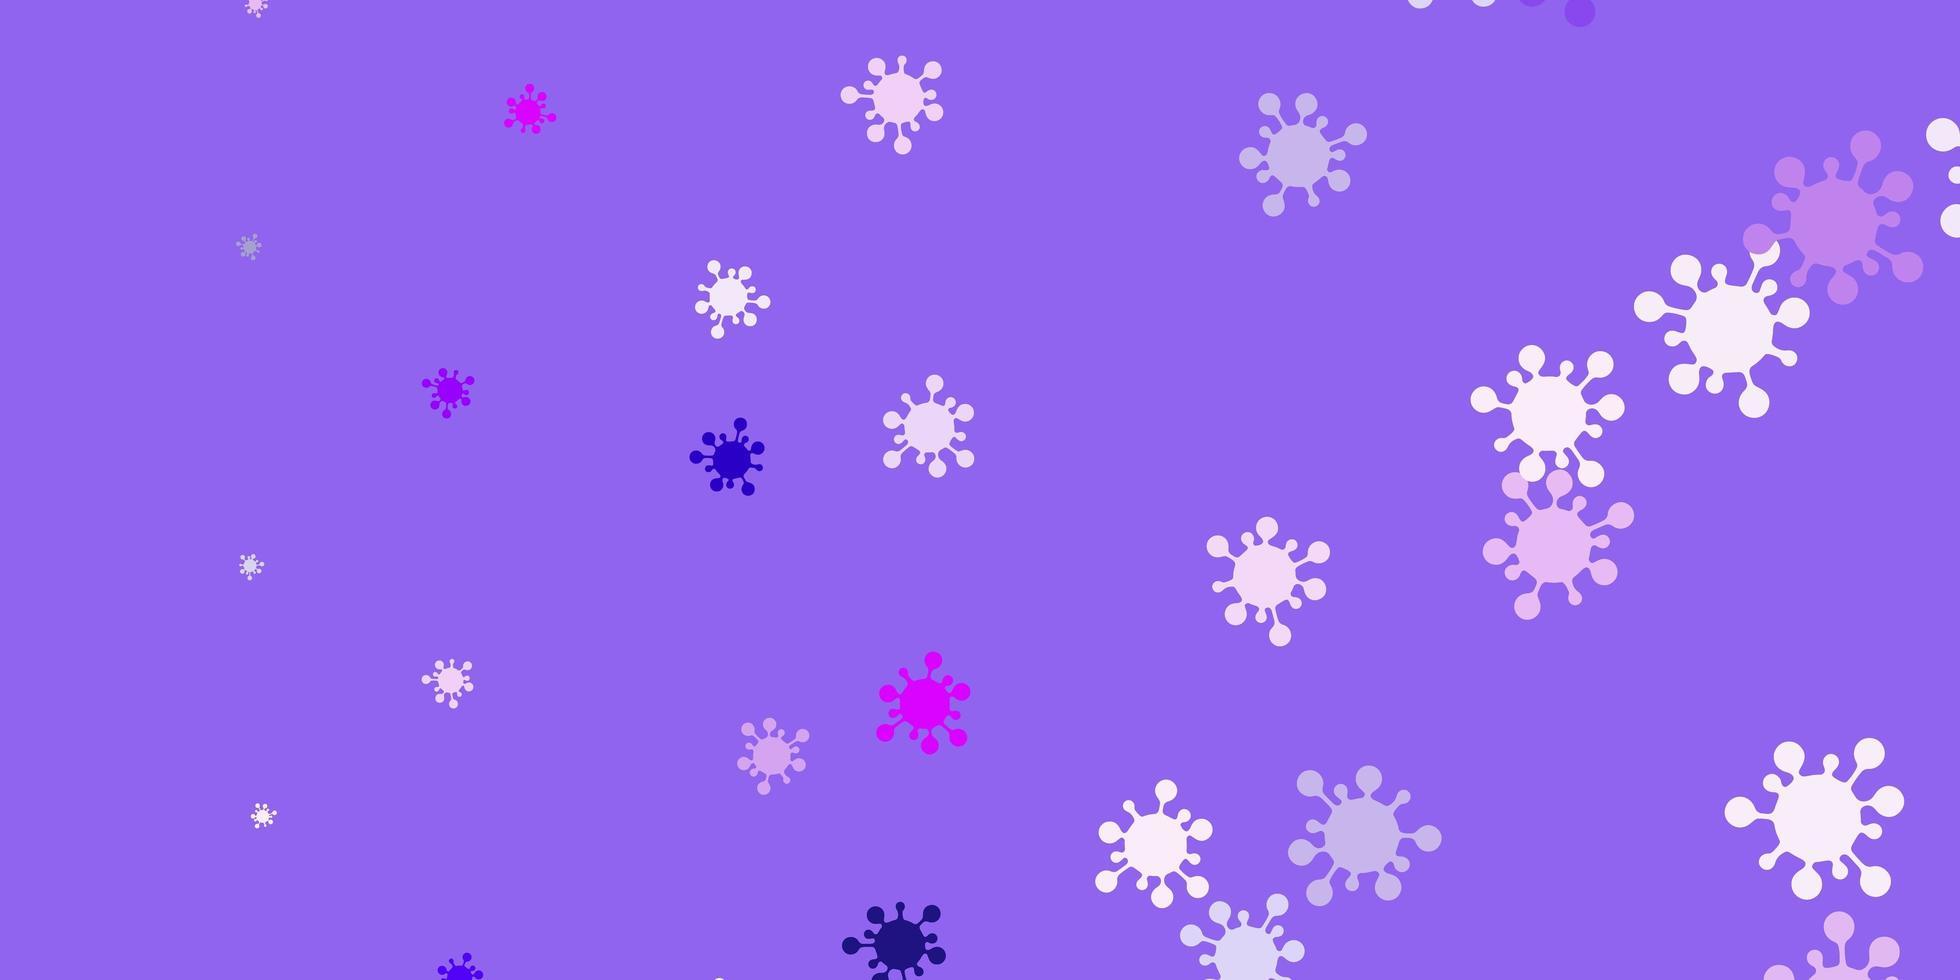 Light purple, pink vector backdrop with virus symbols